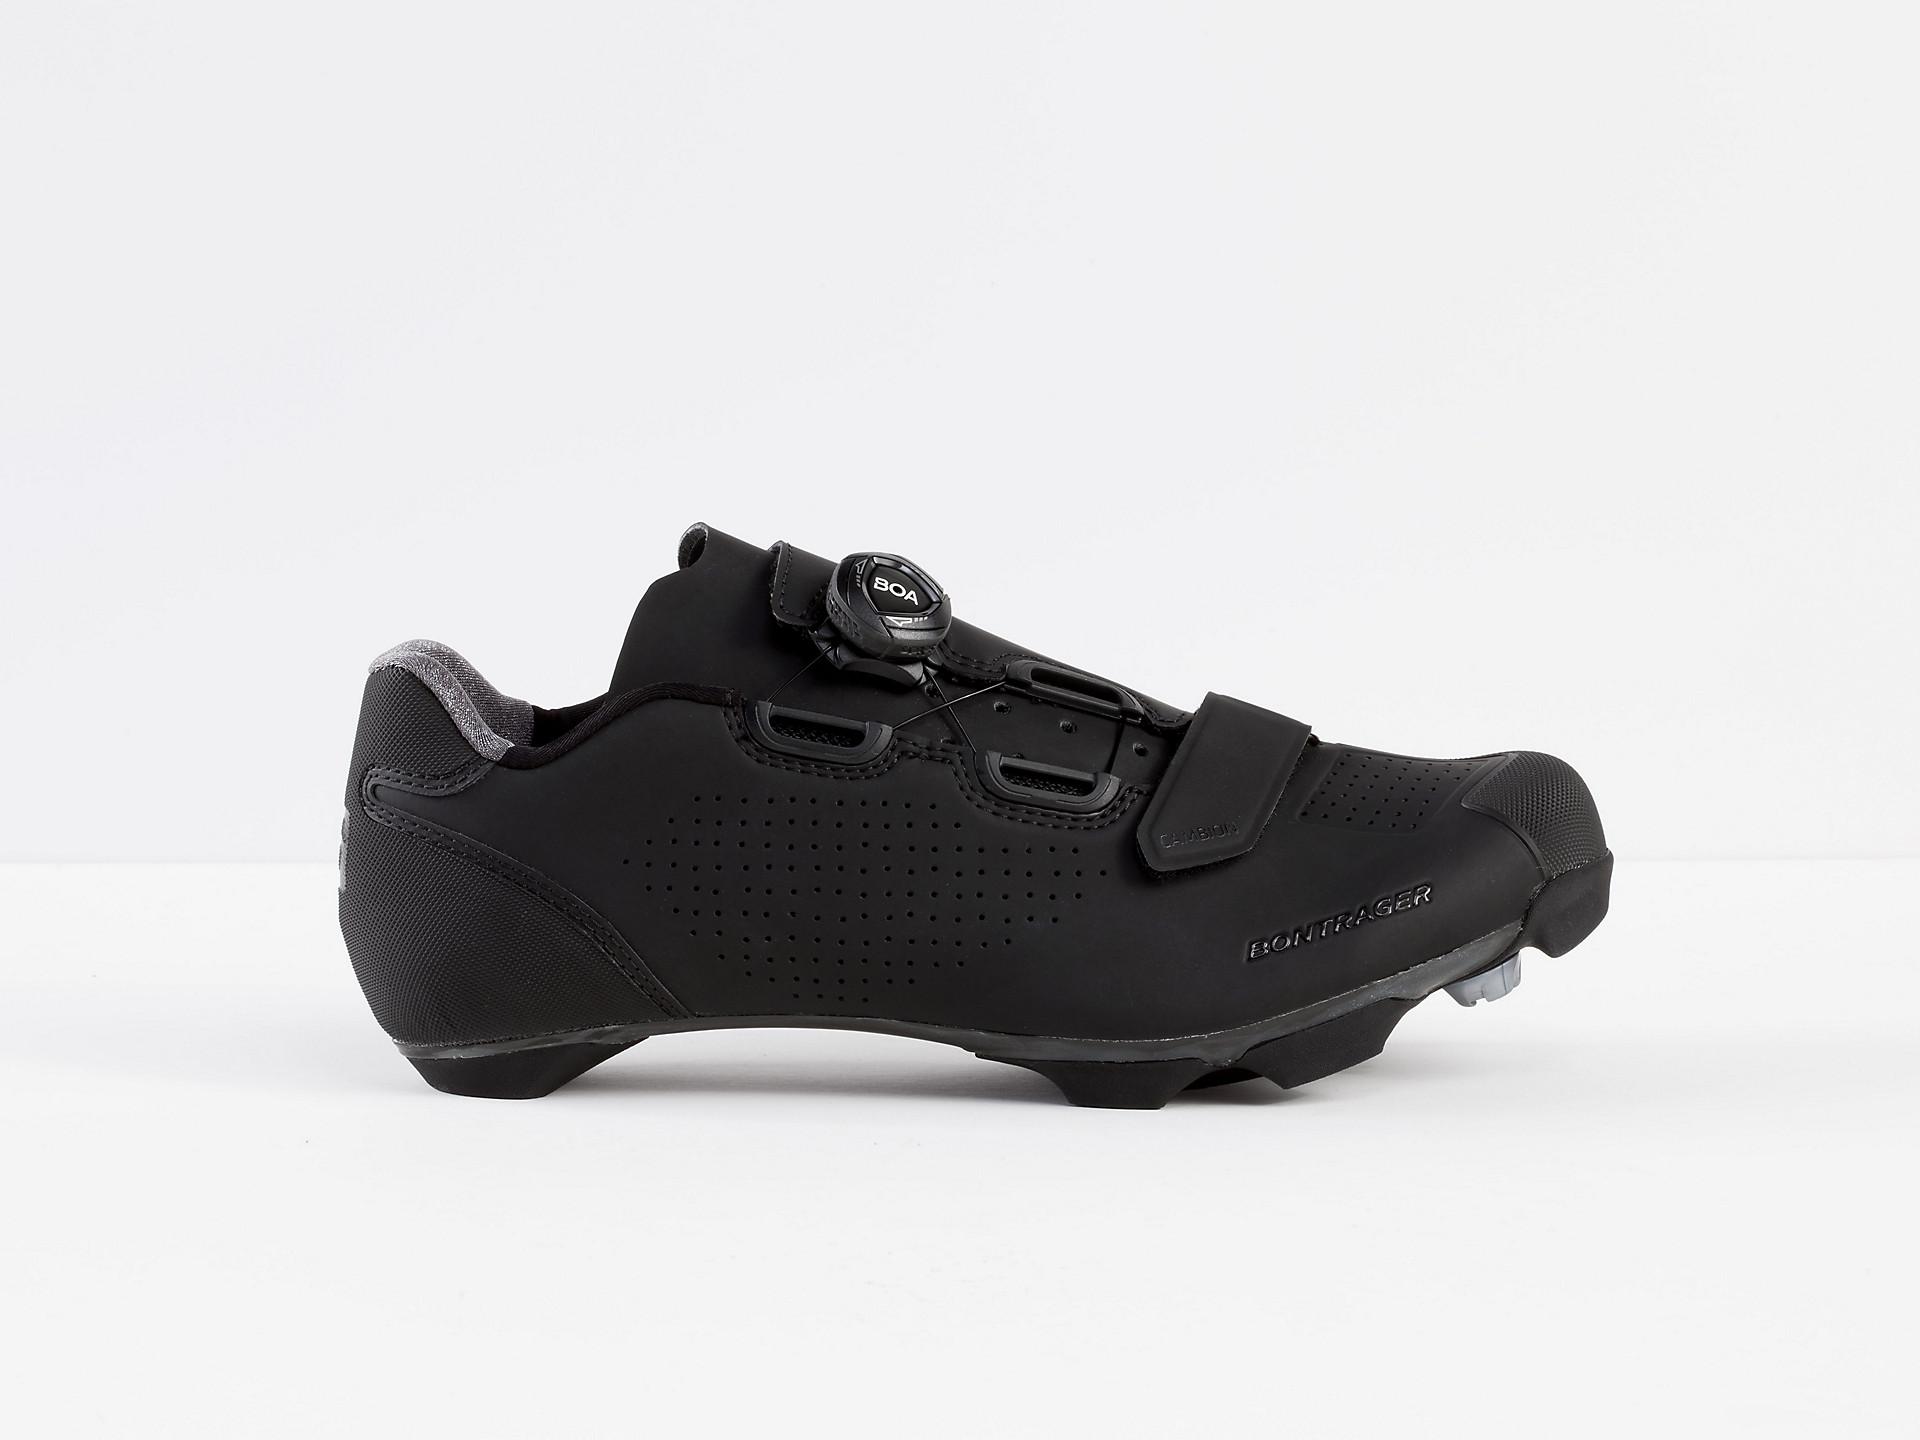 bf374cc86af Bontrager Cambion Mountain Shoe | Trek Bikes